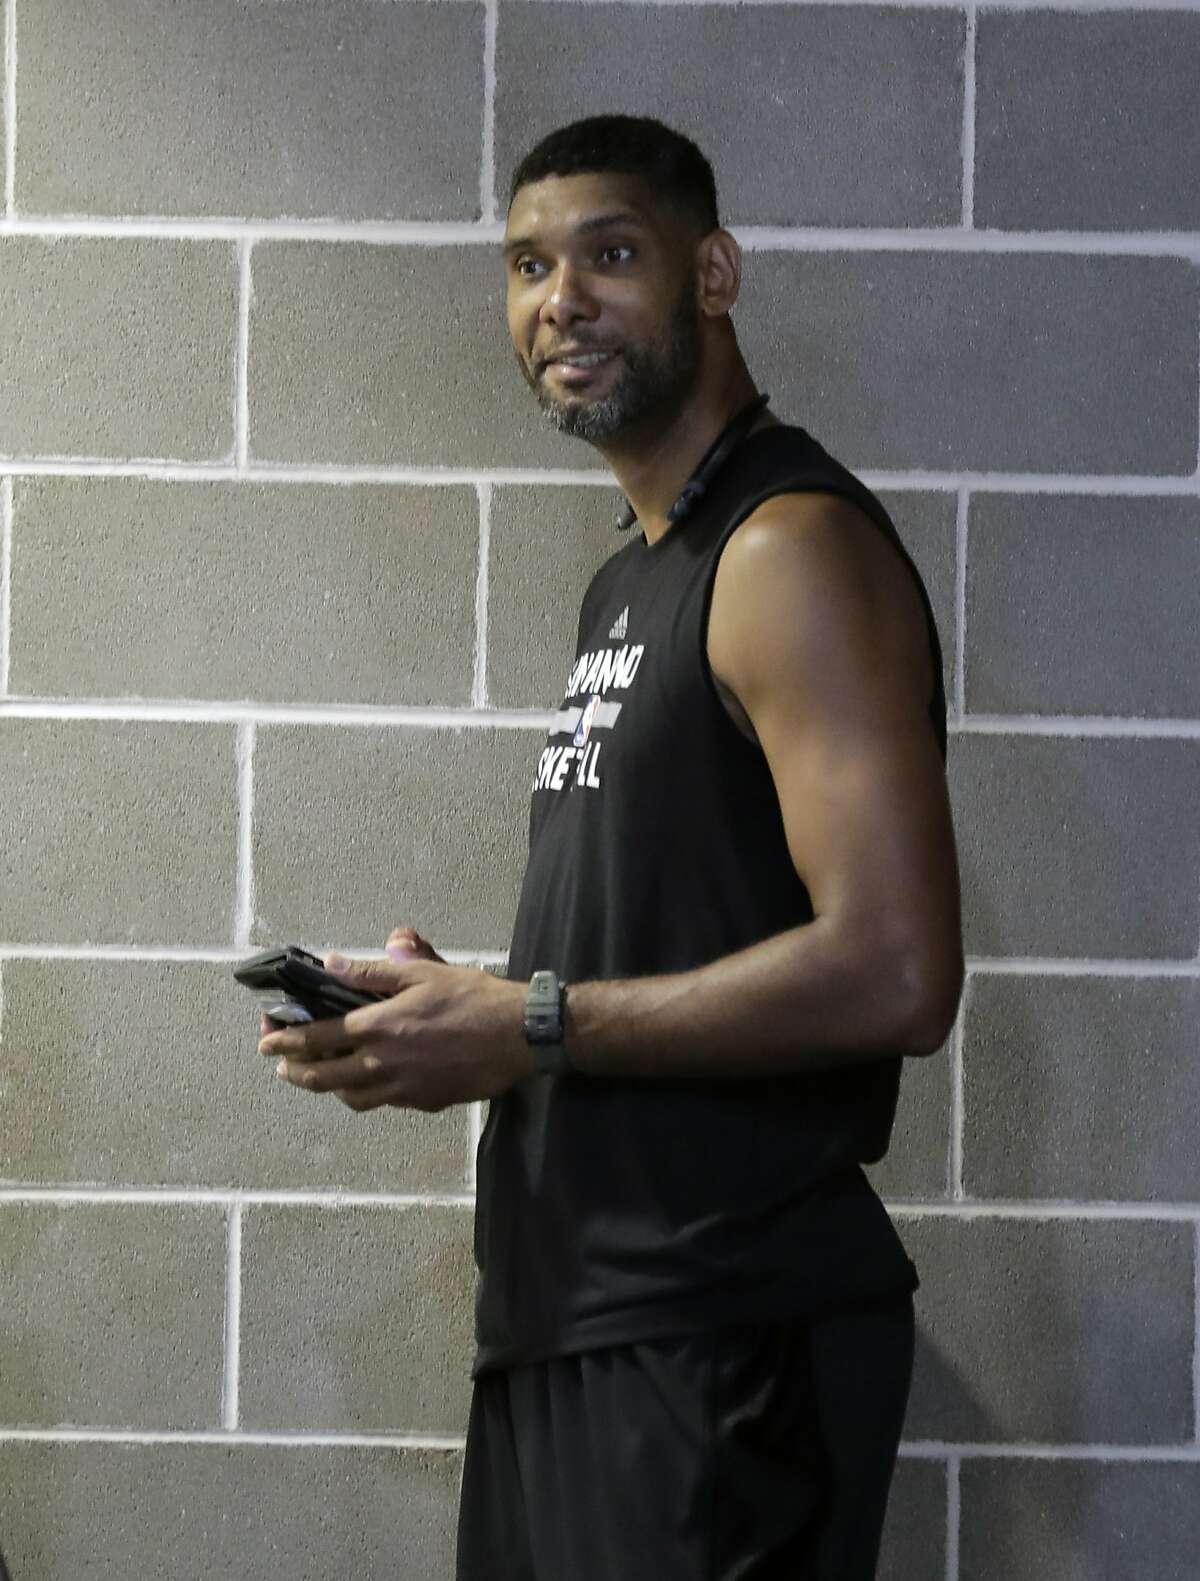 Former San Antonio Spurs forward Tim Duncan at the team's facility, Monday, Sept. 25, 2017, in San Antonio. (AP Photo/Eric Gay)